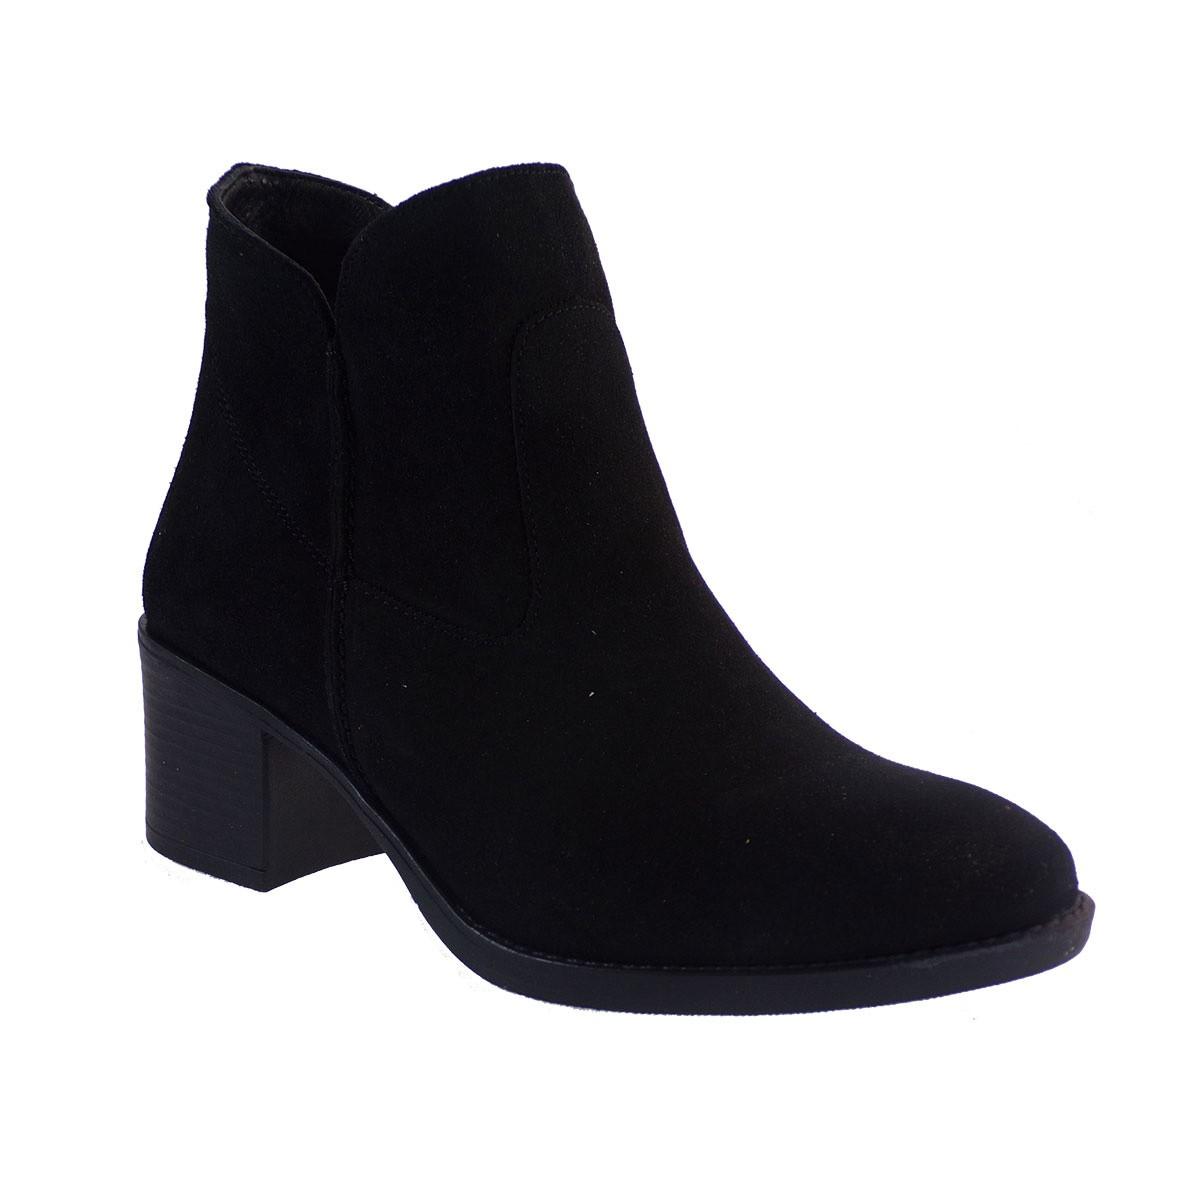 Commanchero Γυναικεία Παπούτσια Μποτάκια 5564-421 Μαύρο Καστόρι Δέρμα